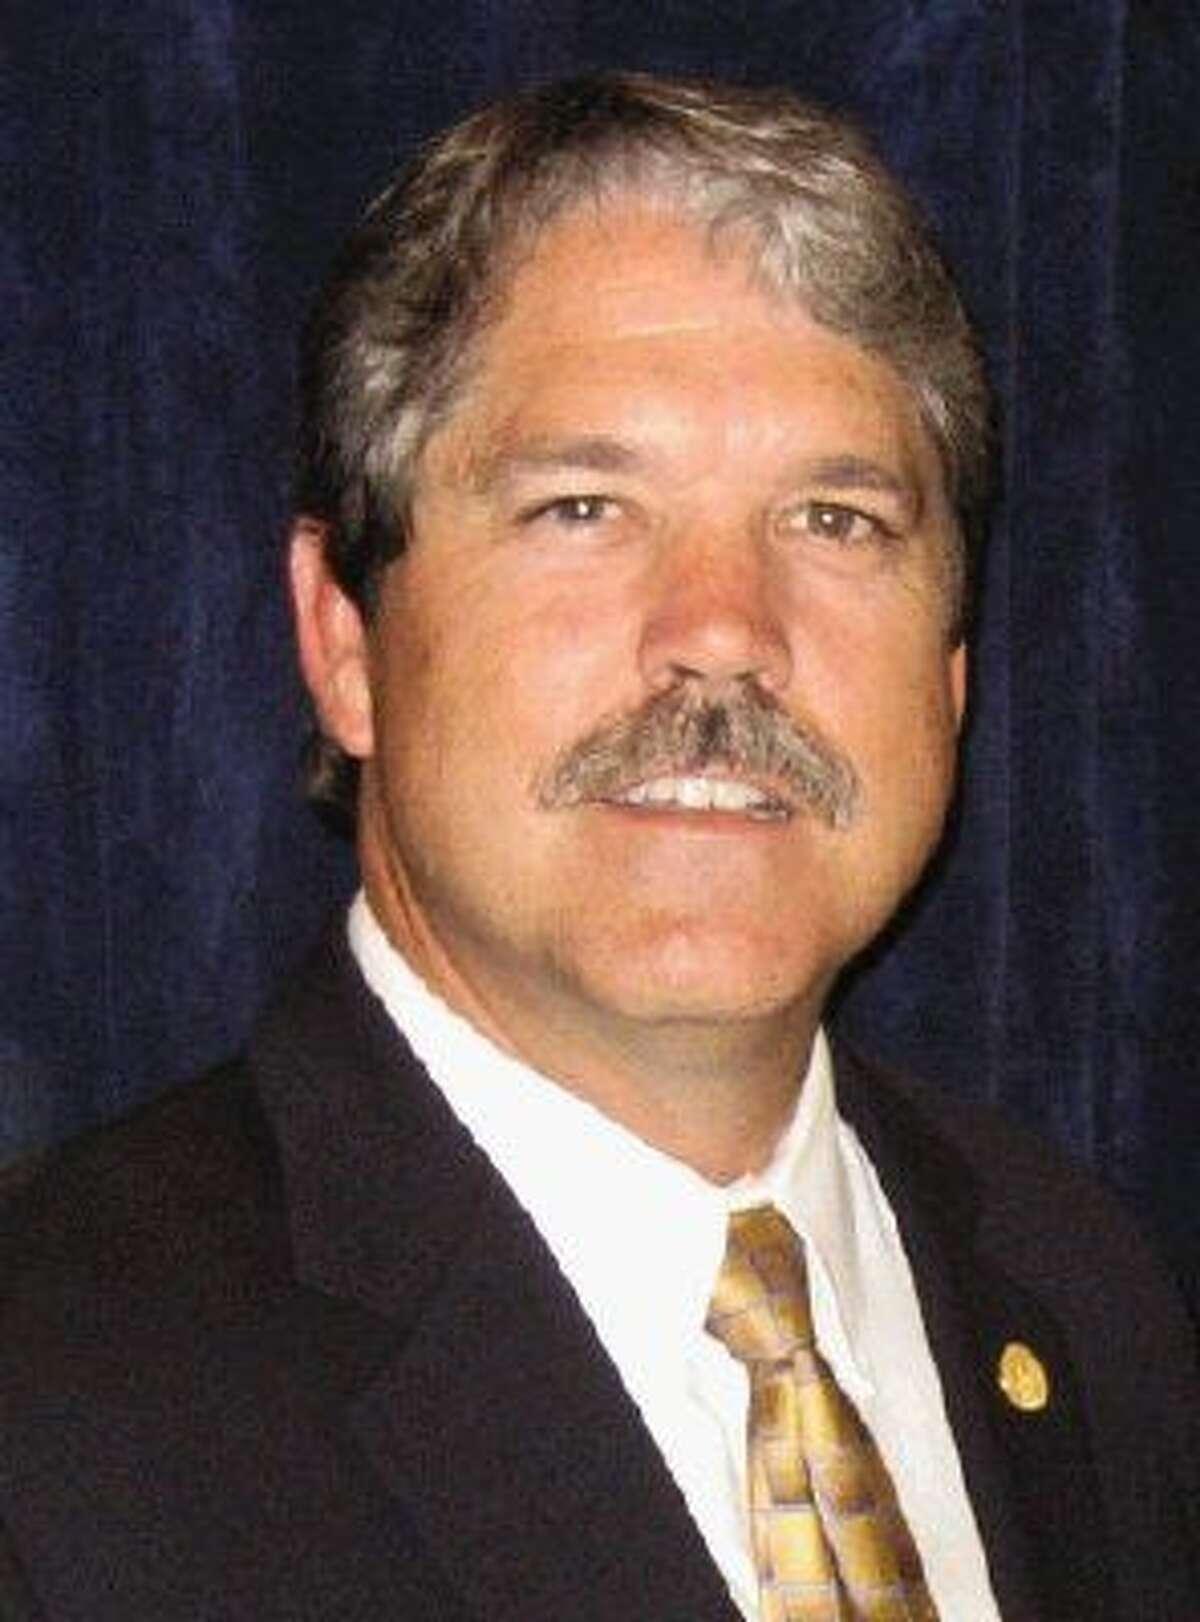 State Sen. Larry Taylor, R-Friendswood